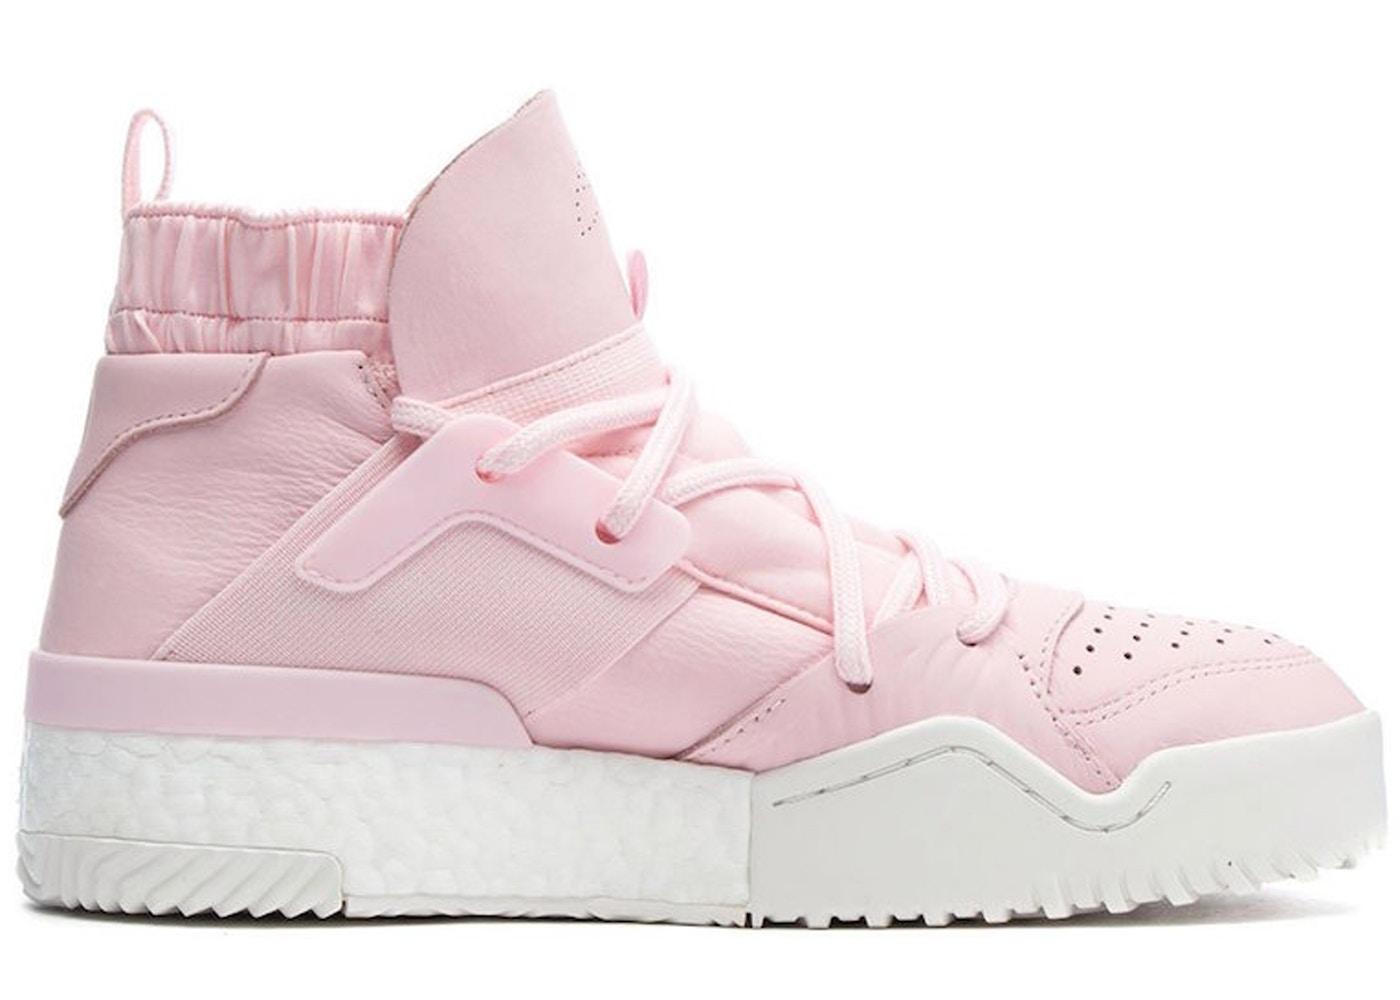 Enviar simbólico carga  adidas AW Bball Alexander Wang Clear Pink - G28225